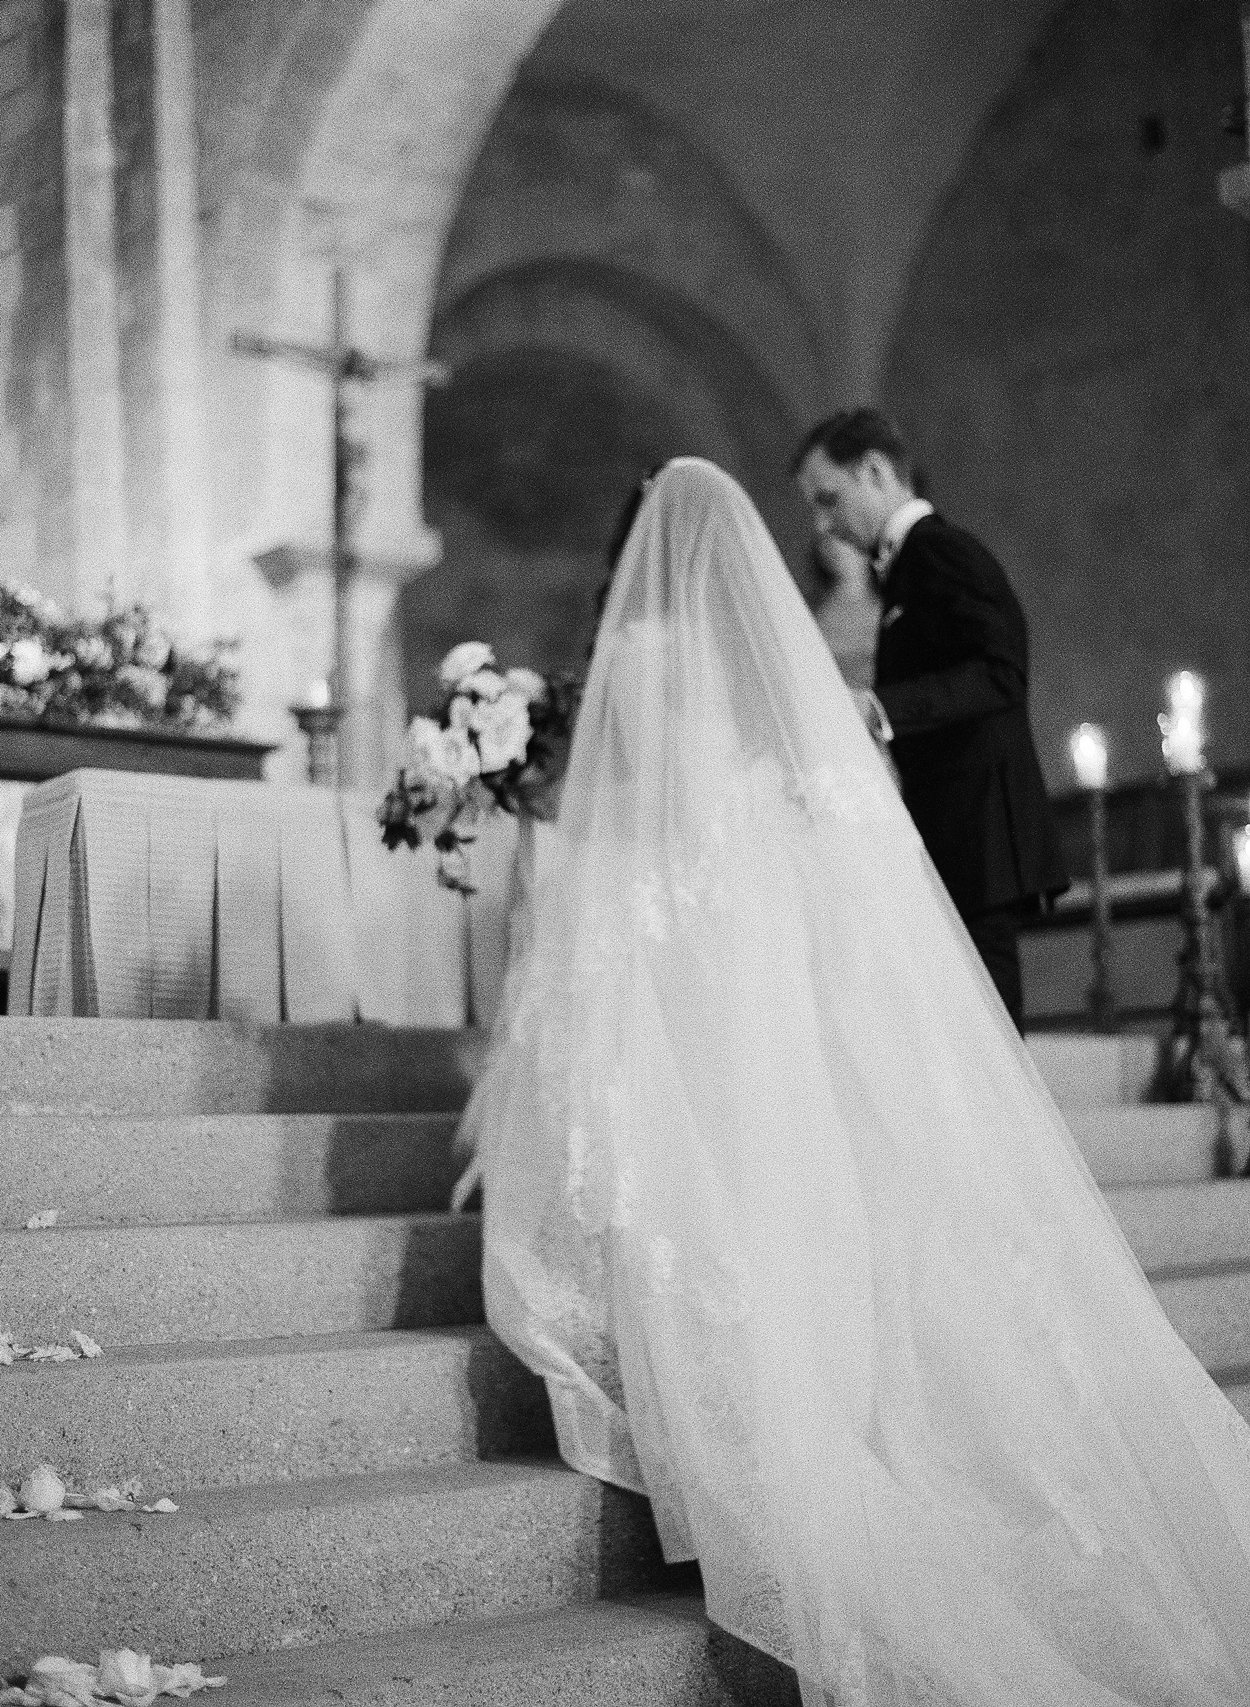 bride and groom at catholic ceremony wedding alter